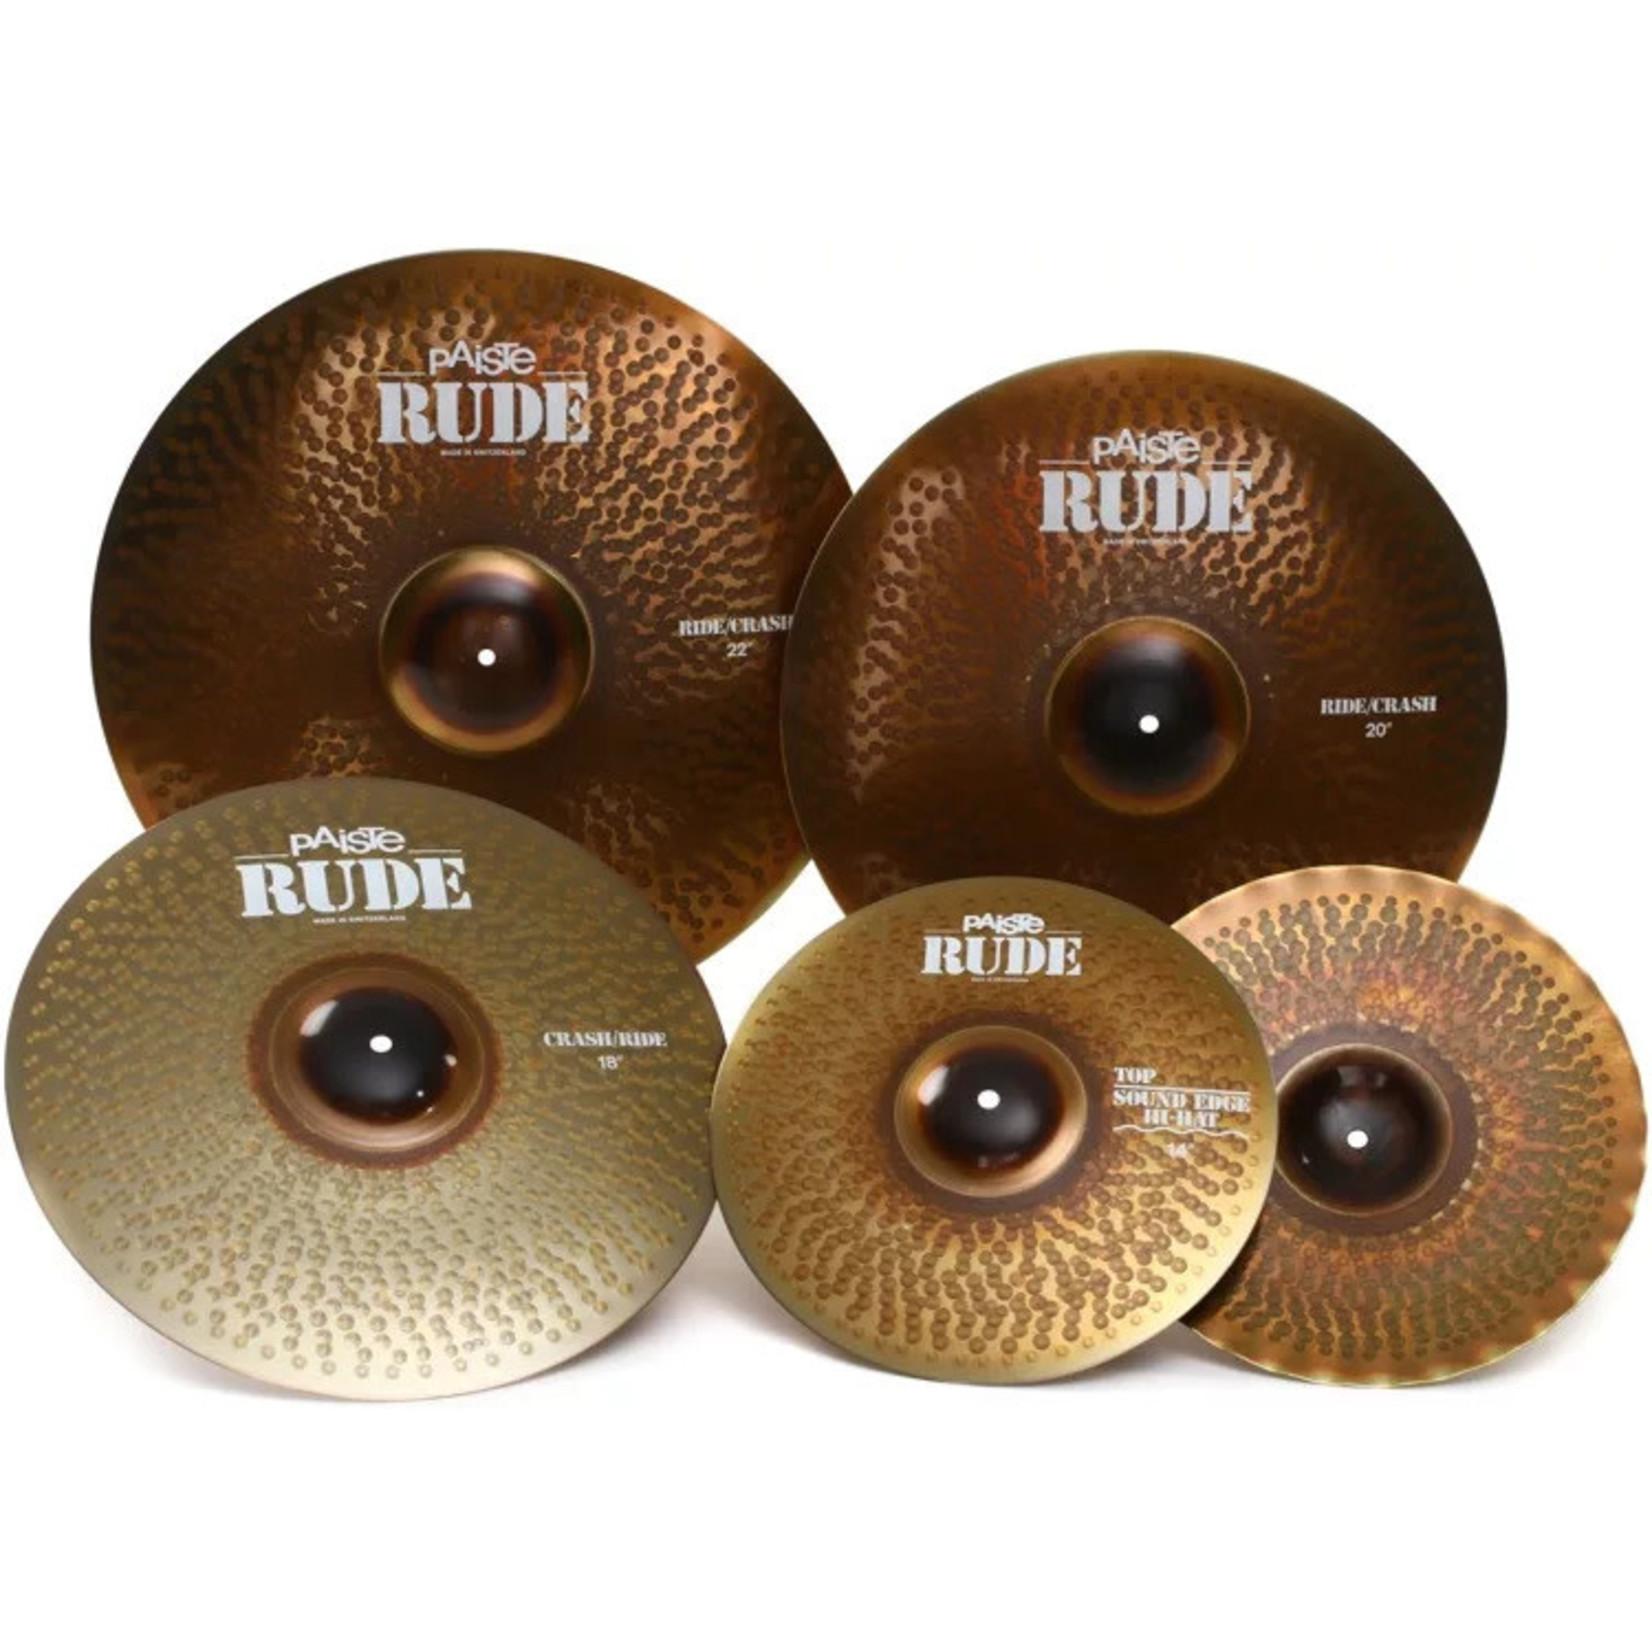 "Paiste Paiste RUDE Cymbal Set - 14""/20""/22"" - With Free 18"" Crash/Ride"